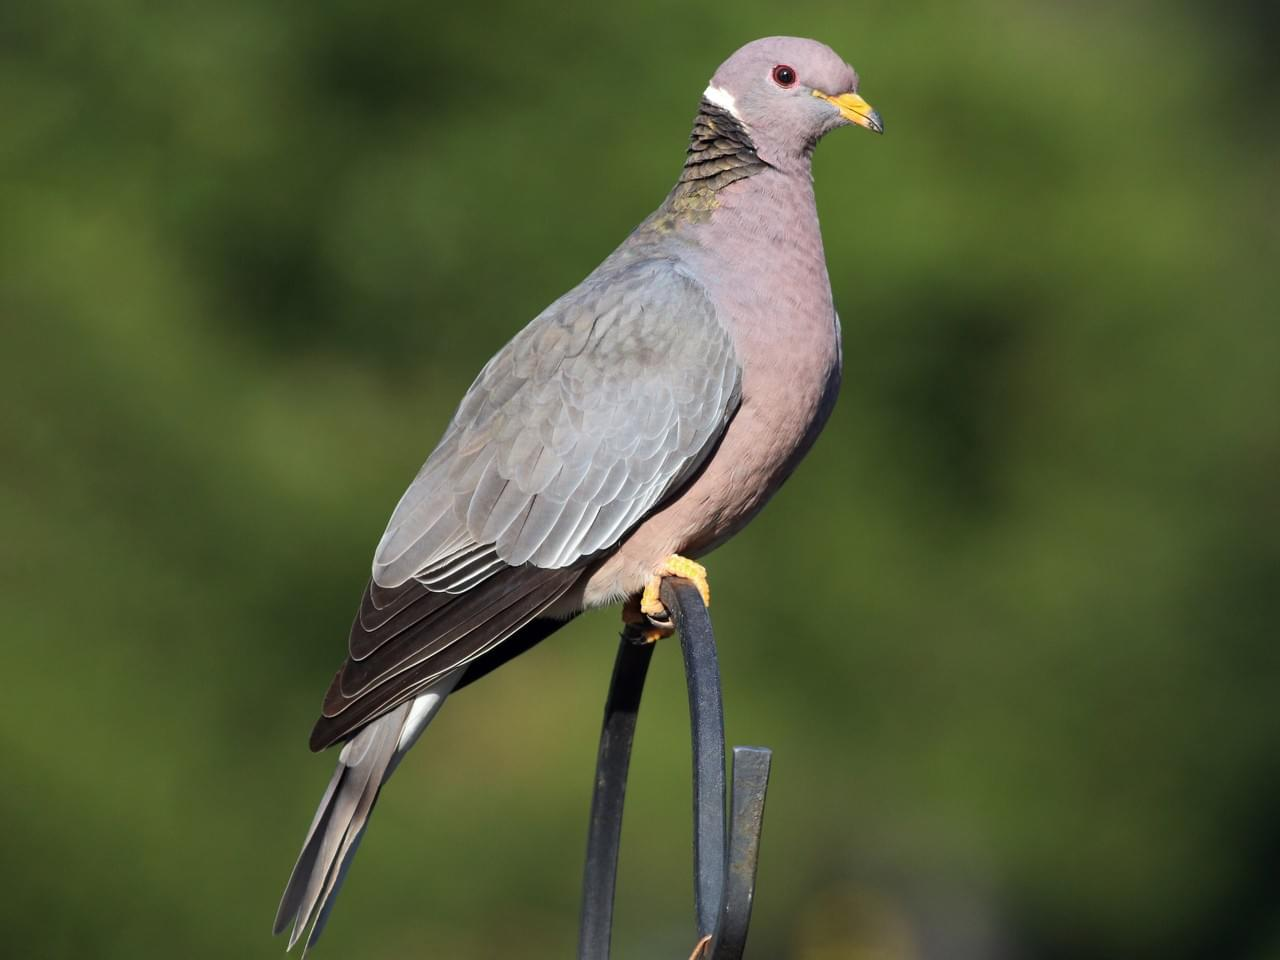 beautiful pigeon pictures paul fenswick